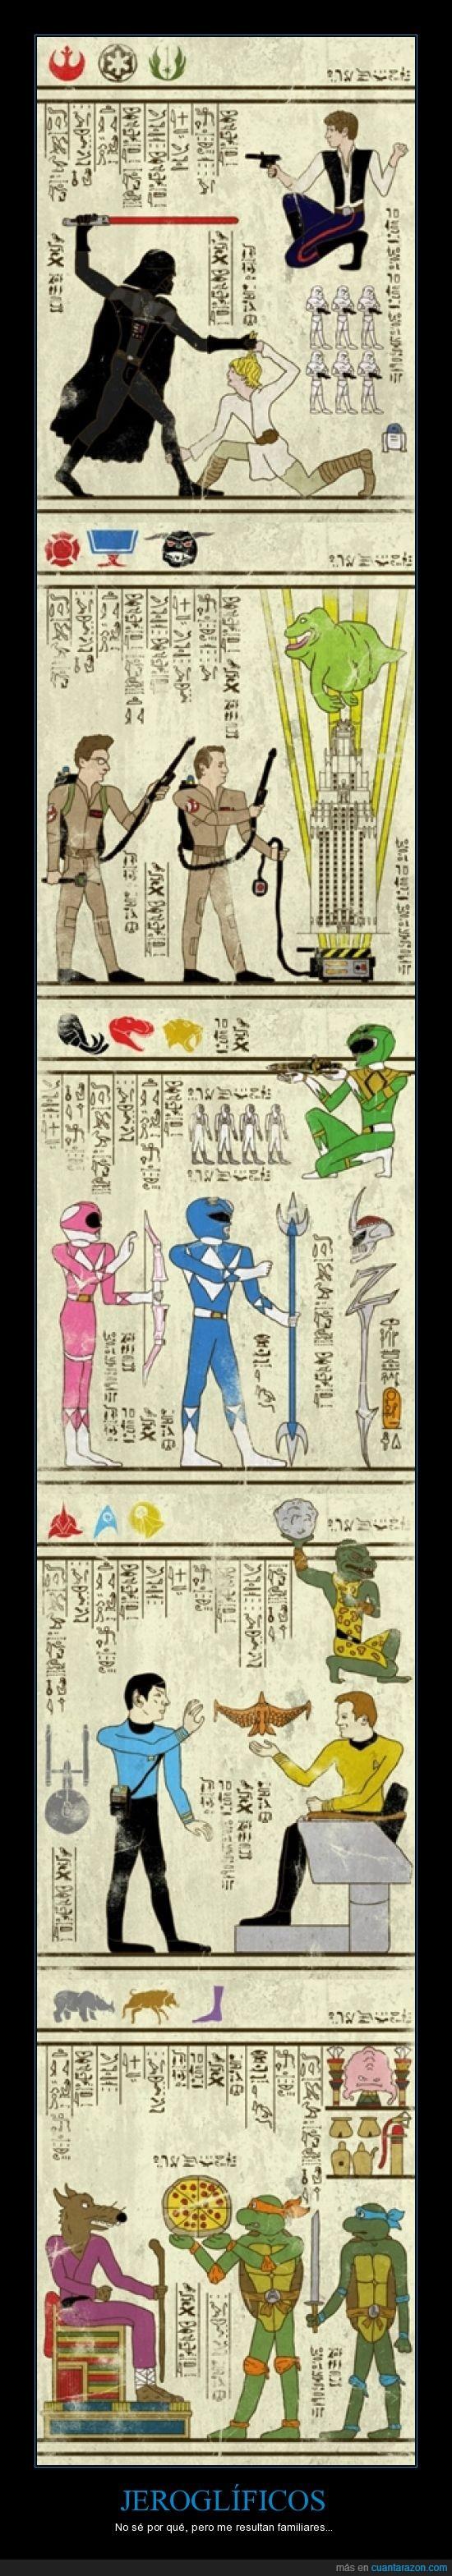 cazafanasmas,egipto,jeroglifico,pelicula,power rangers,star trek,star wars